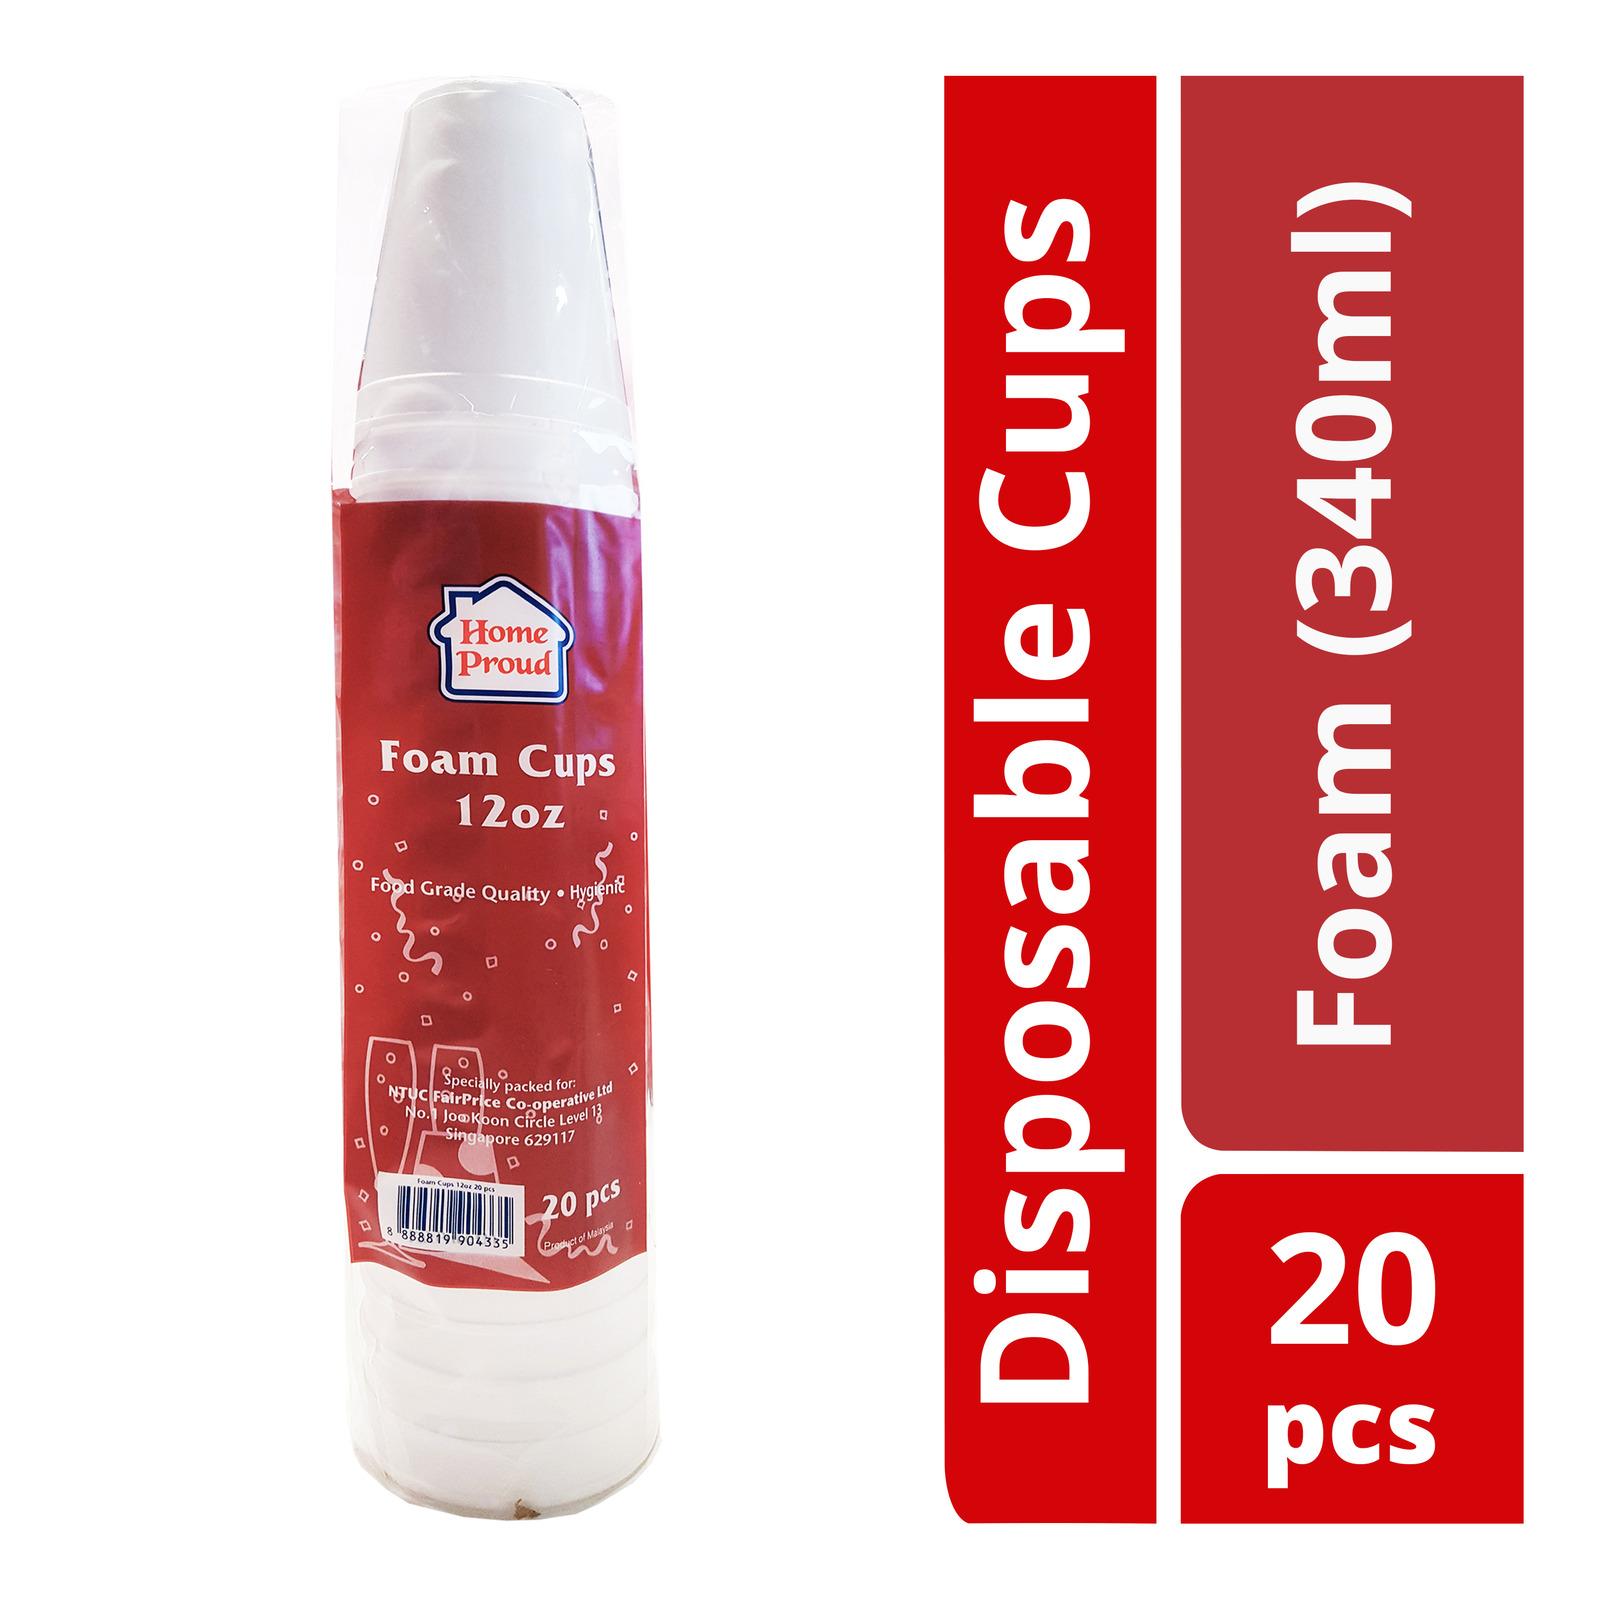 HomeProud Disposable Cups - Foam (340ml)